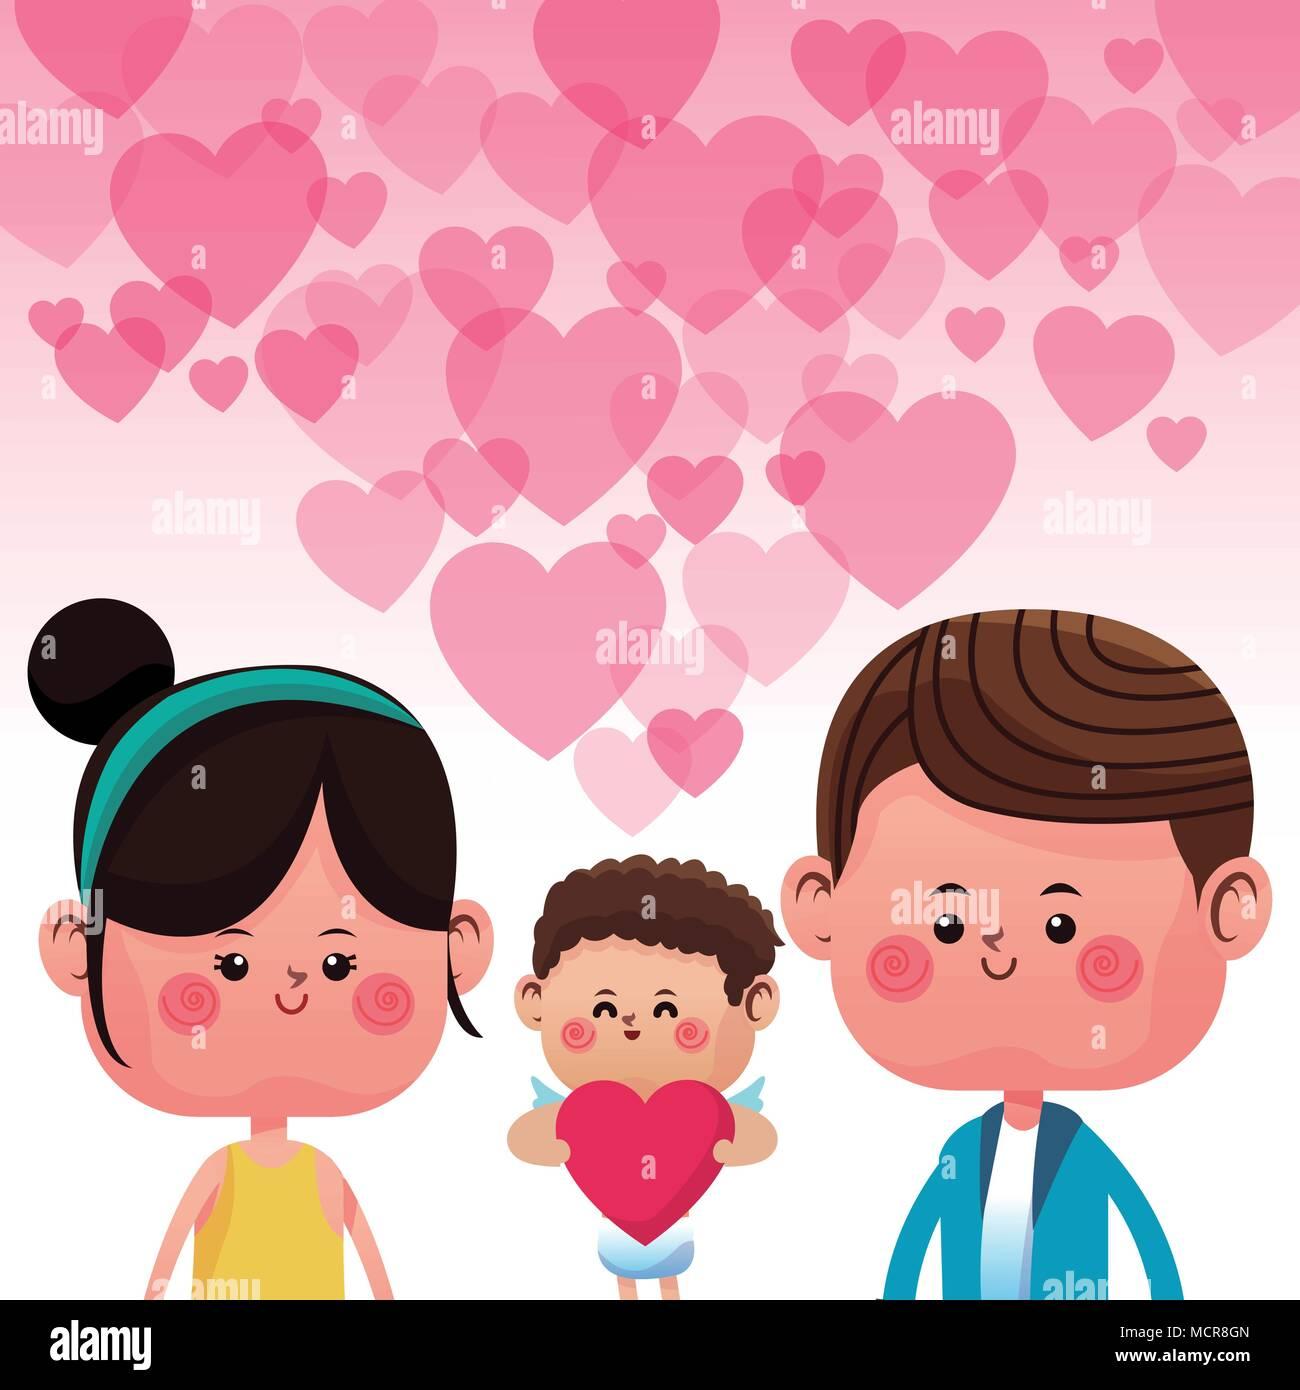 Cute Couple In Love Cartoons Stock Vector Art Illustration Vector